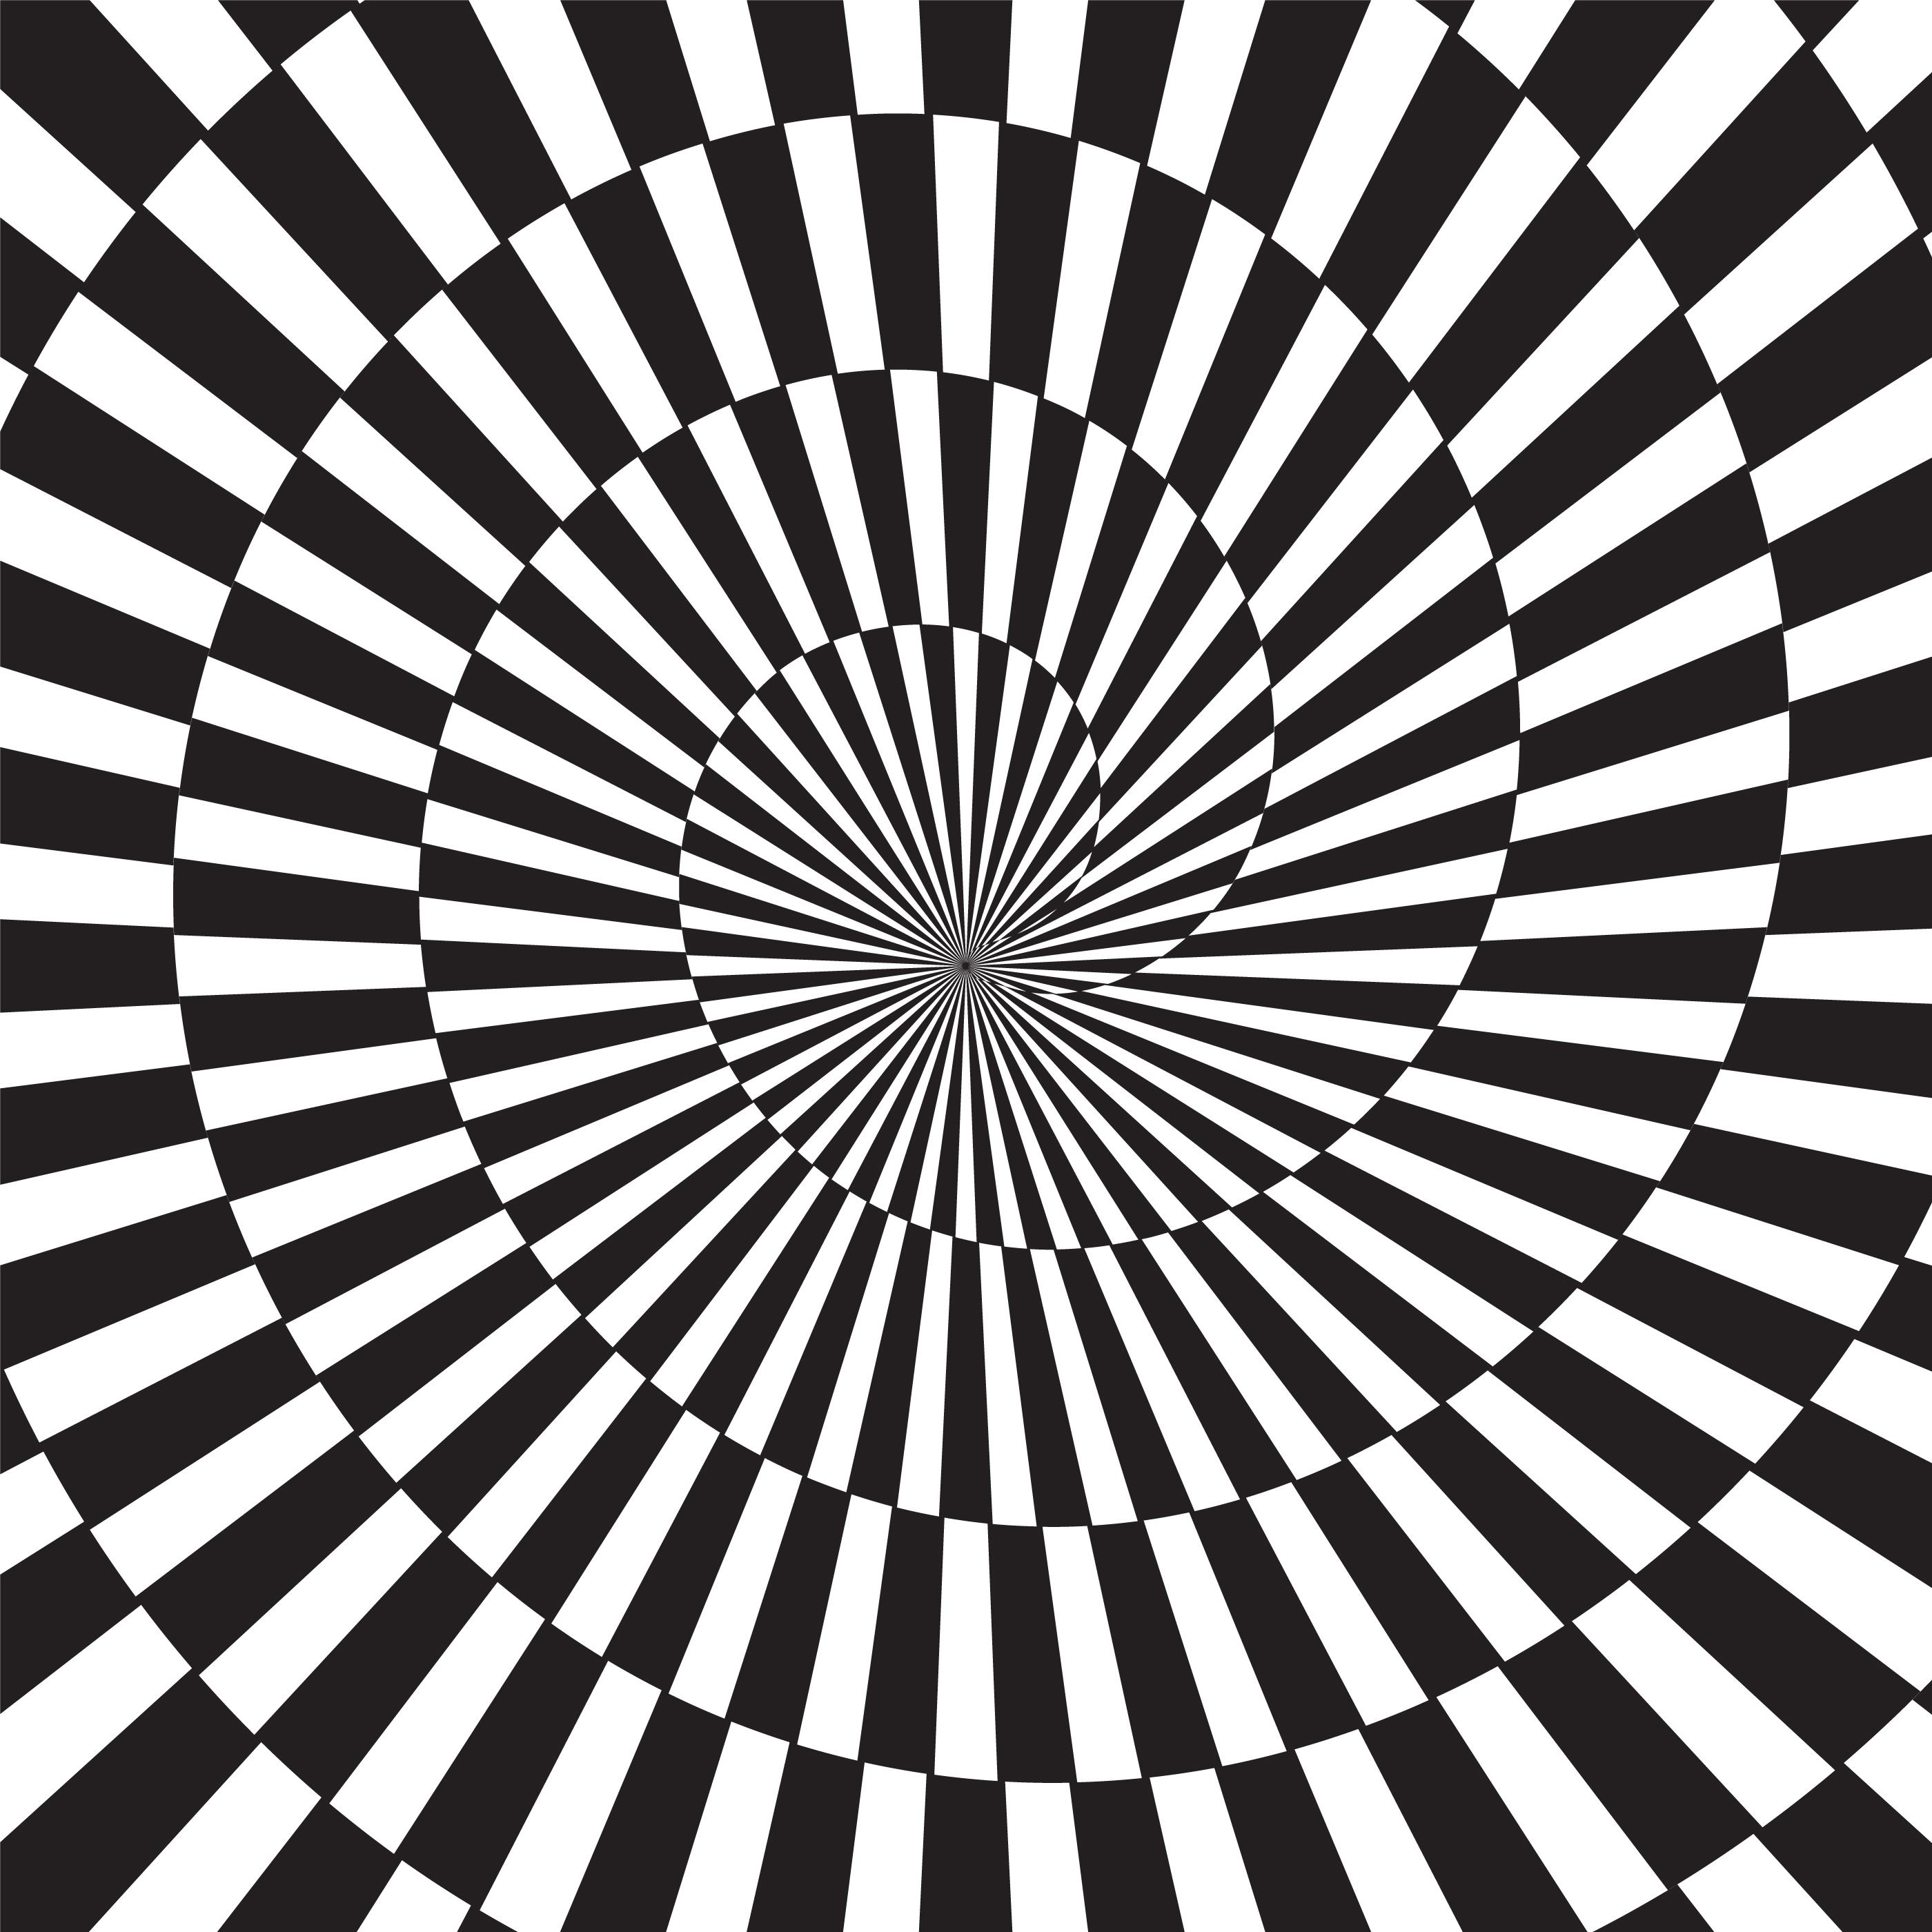 Hallucination, Illusion or Misinterpretation?